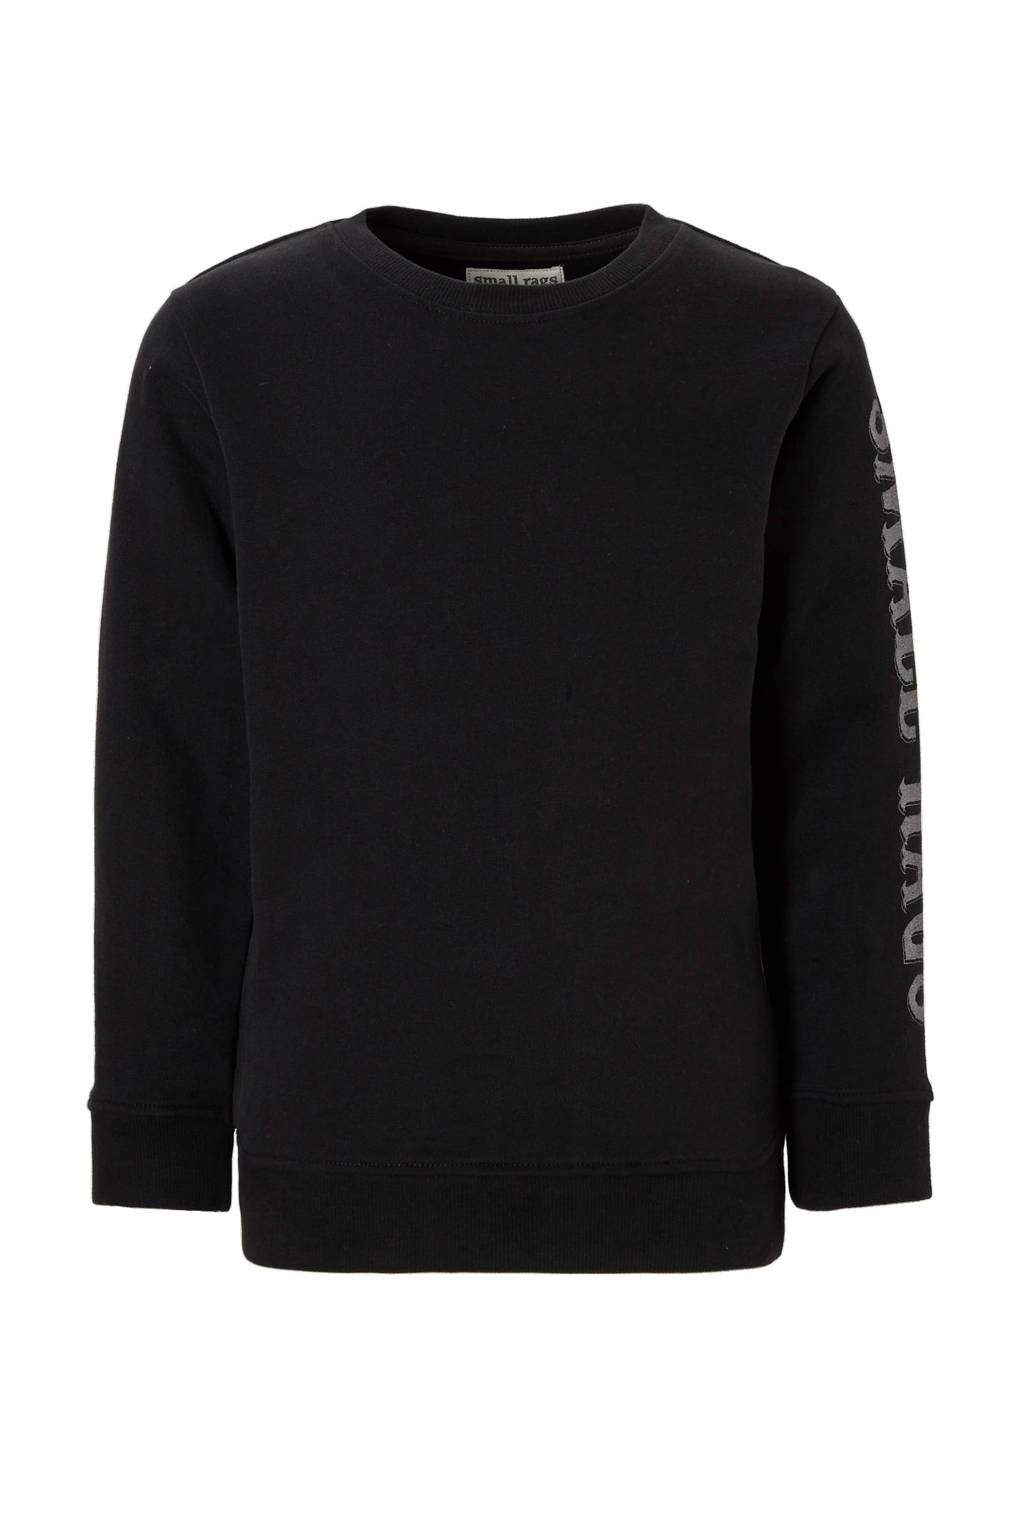 Small Rags sweater Huxi, zwart/ wit